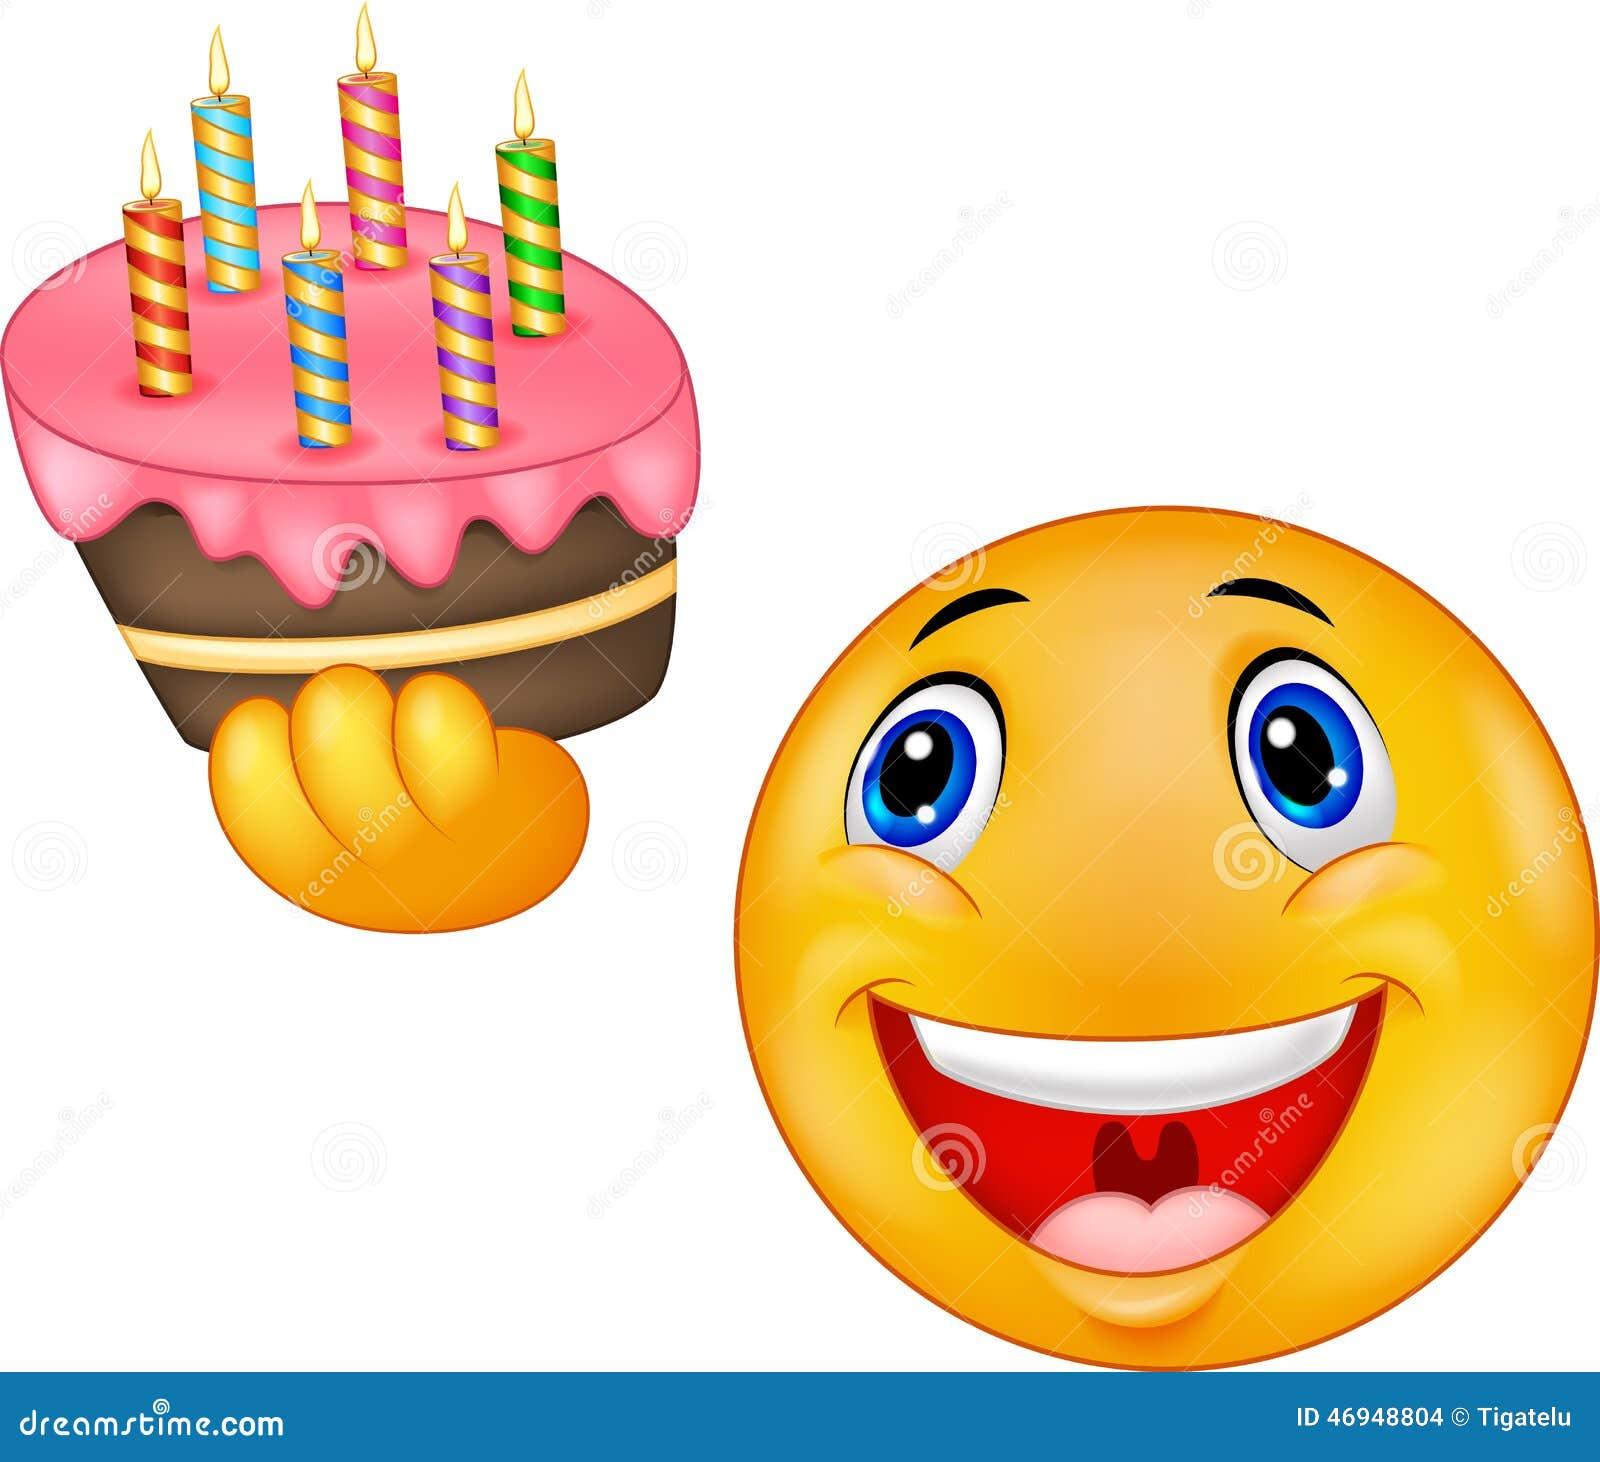 Smiley Emoticon Holding Birthday Cake Stock Vector - Illustration of ...